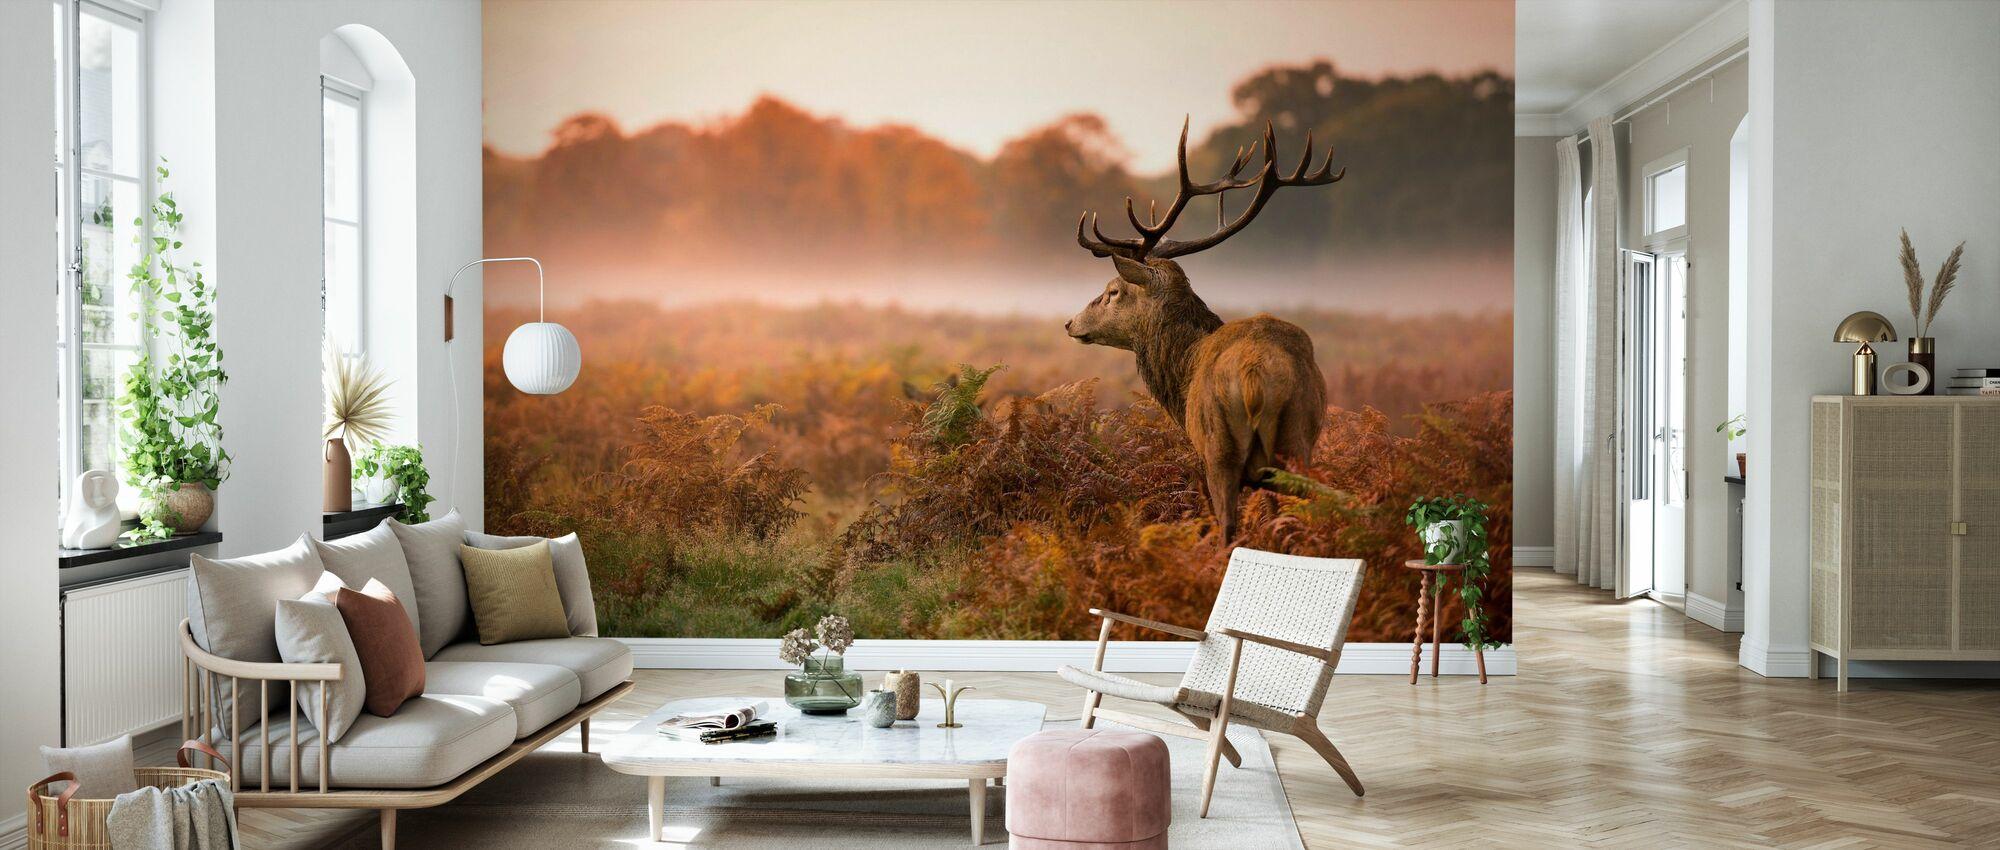 Hjort hjort hjort - Tapet - Stue